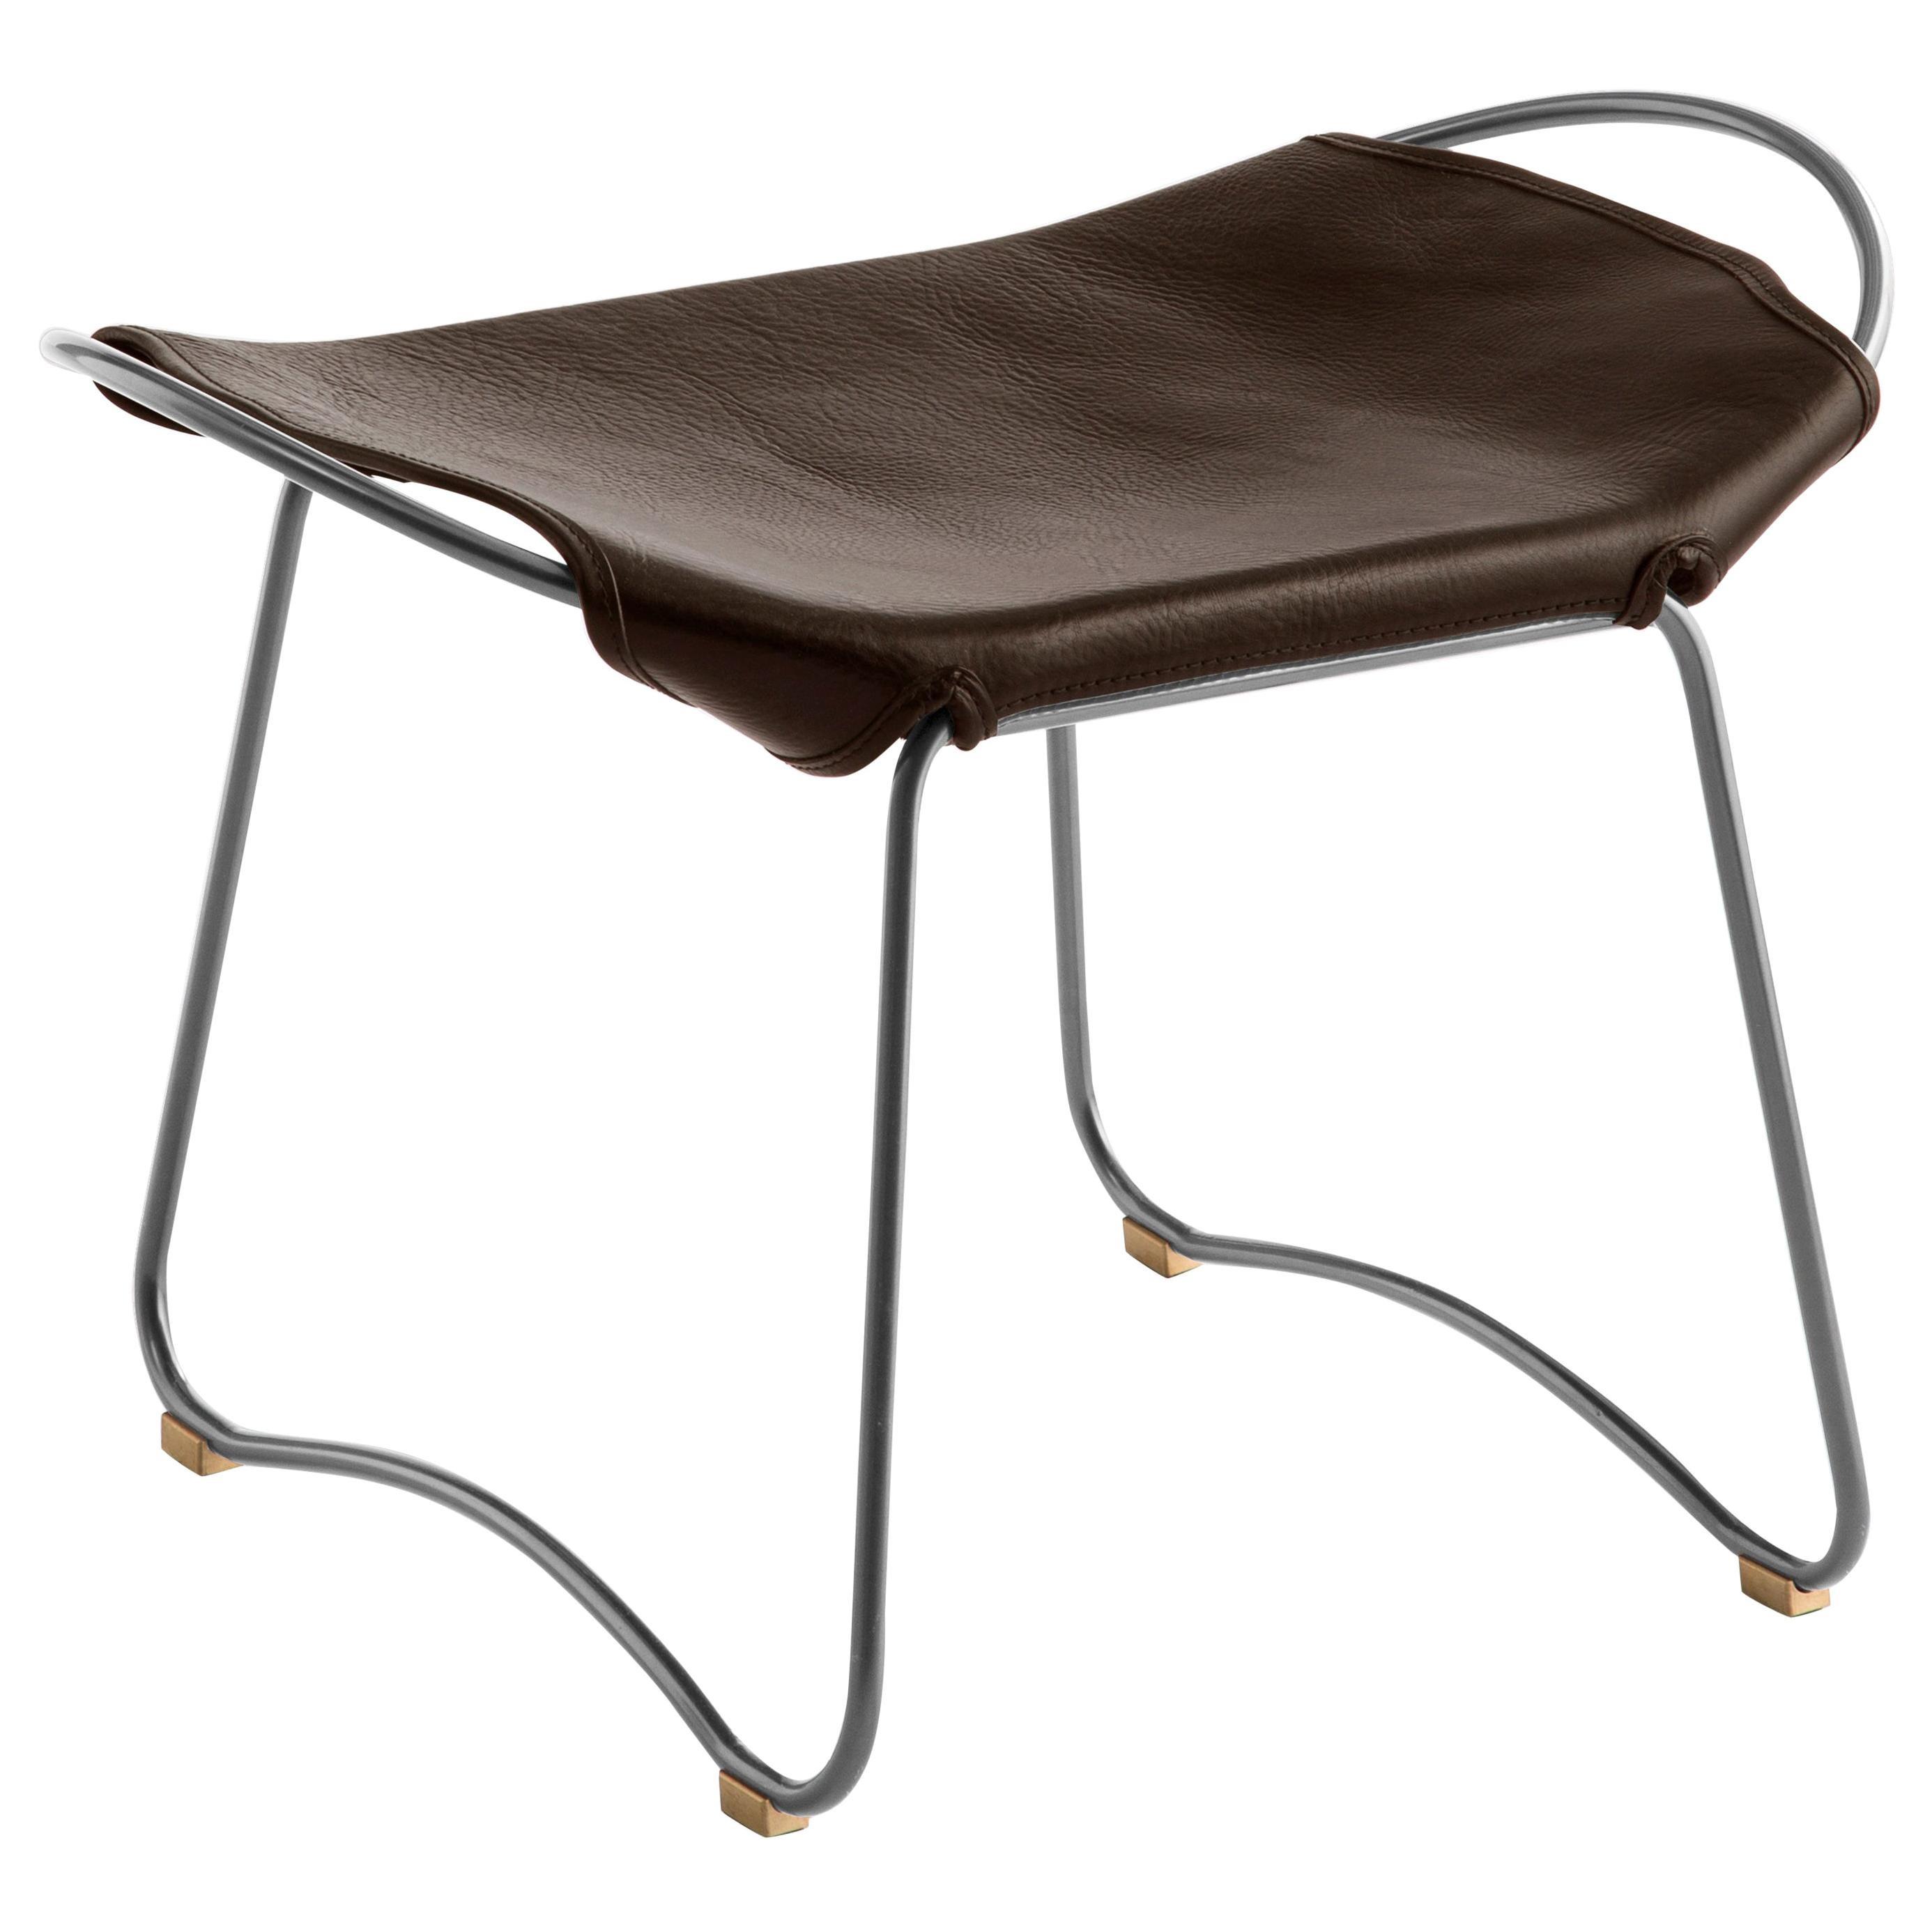 Footstool, Silver Steel and Dark Brown Saddle Leather, Modern Style, Hug